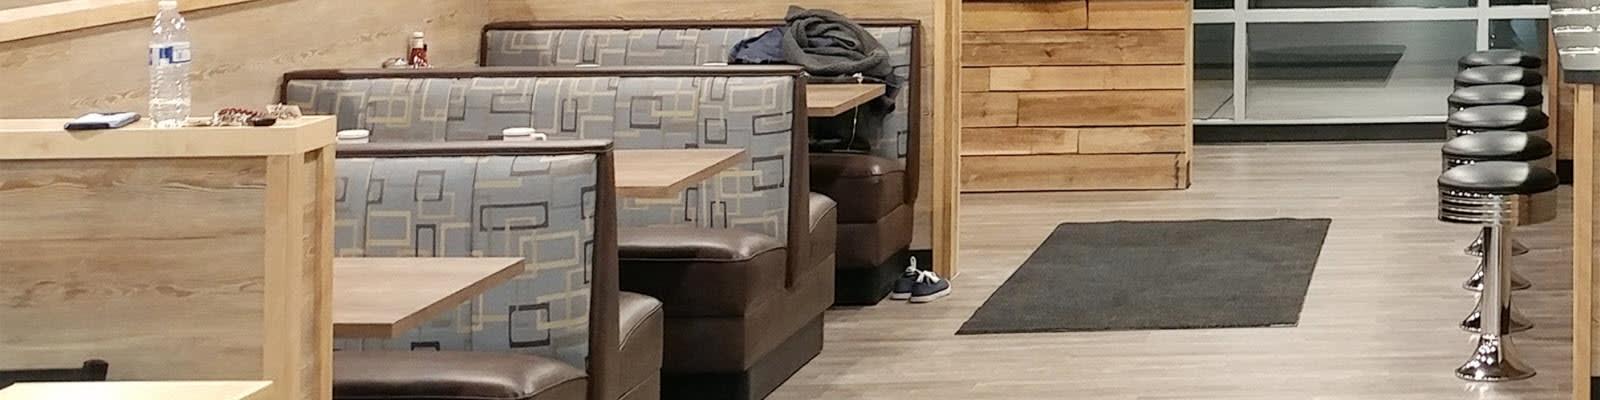 Restaurant diner booths